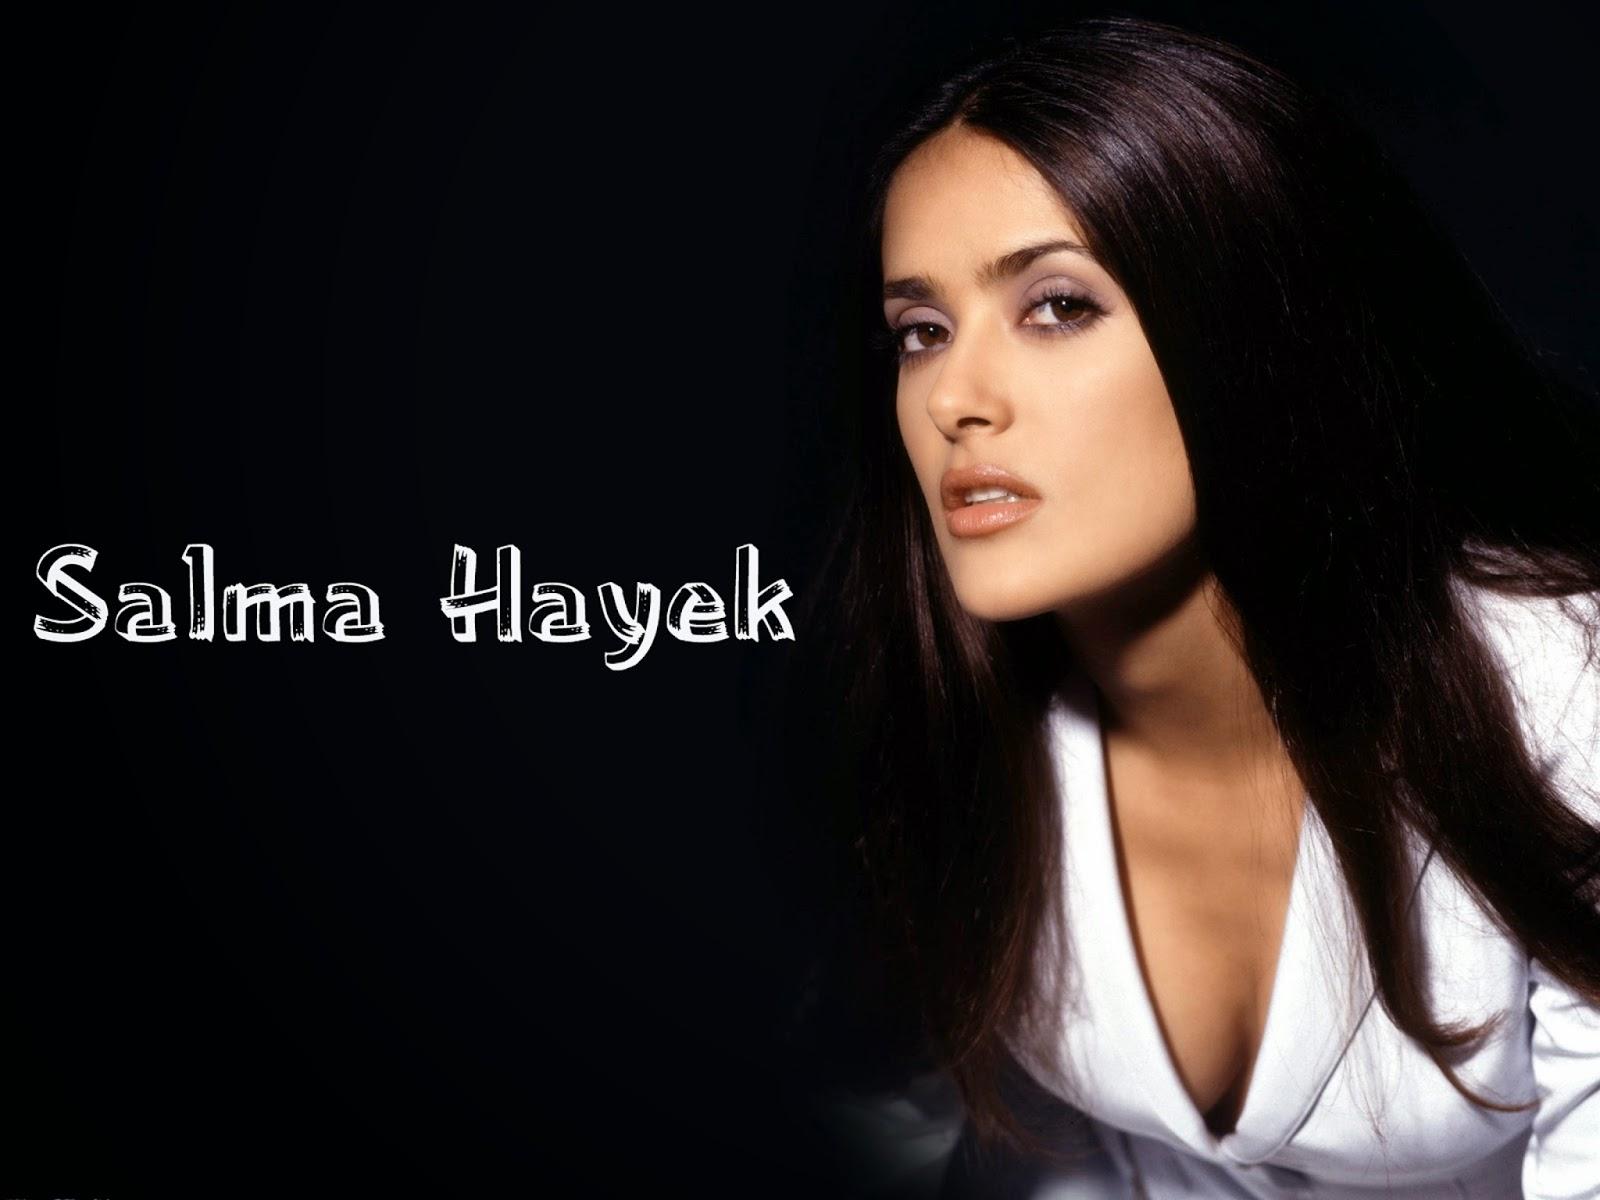 Salma Hayek Hd Wallpapers Free Download